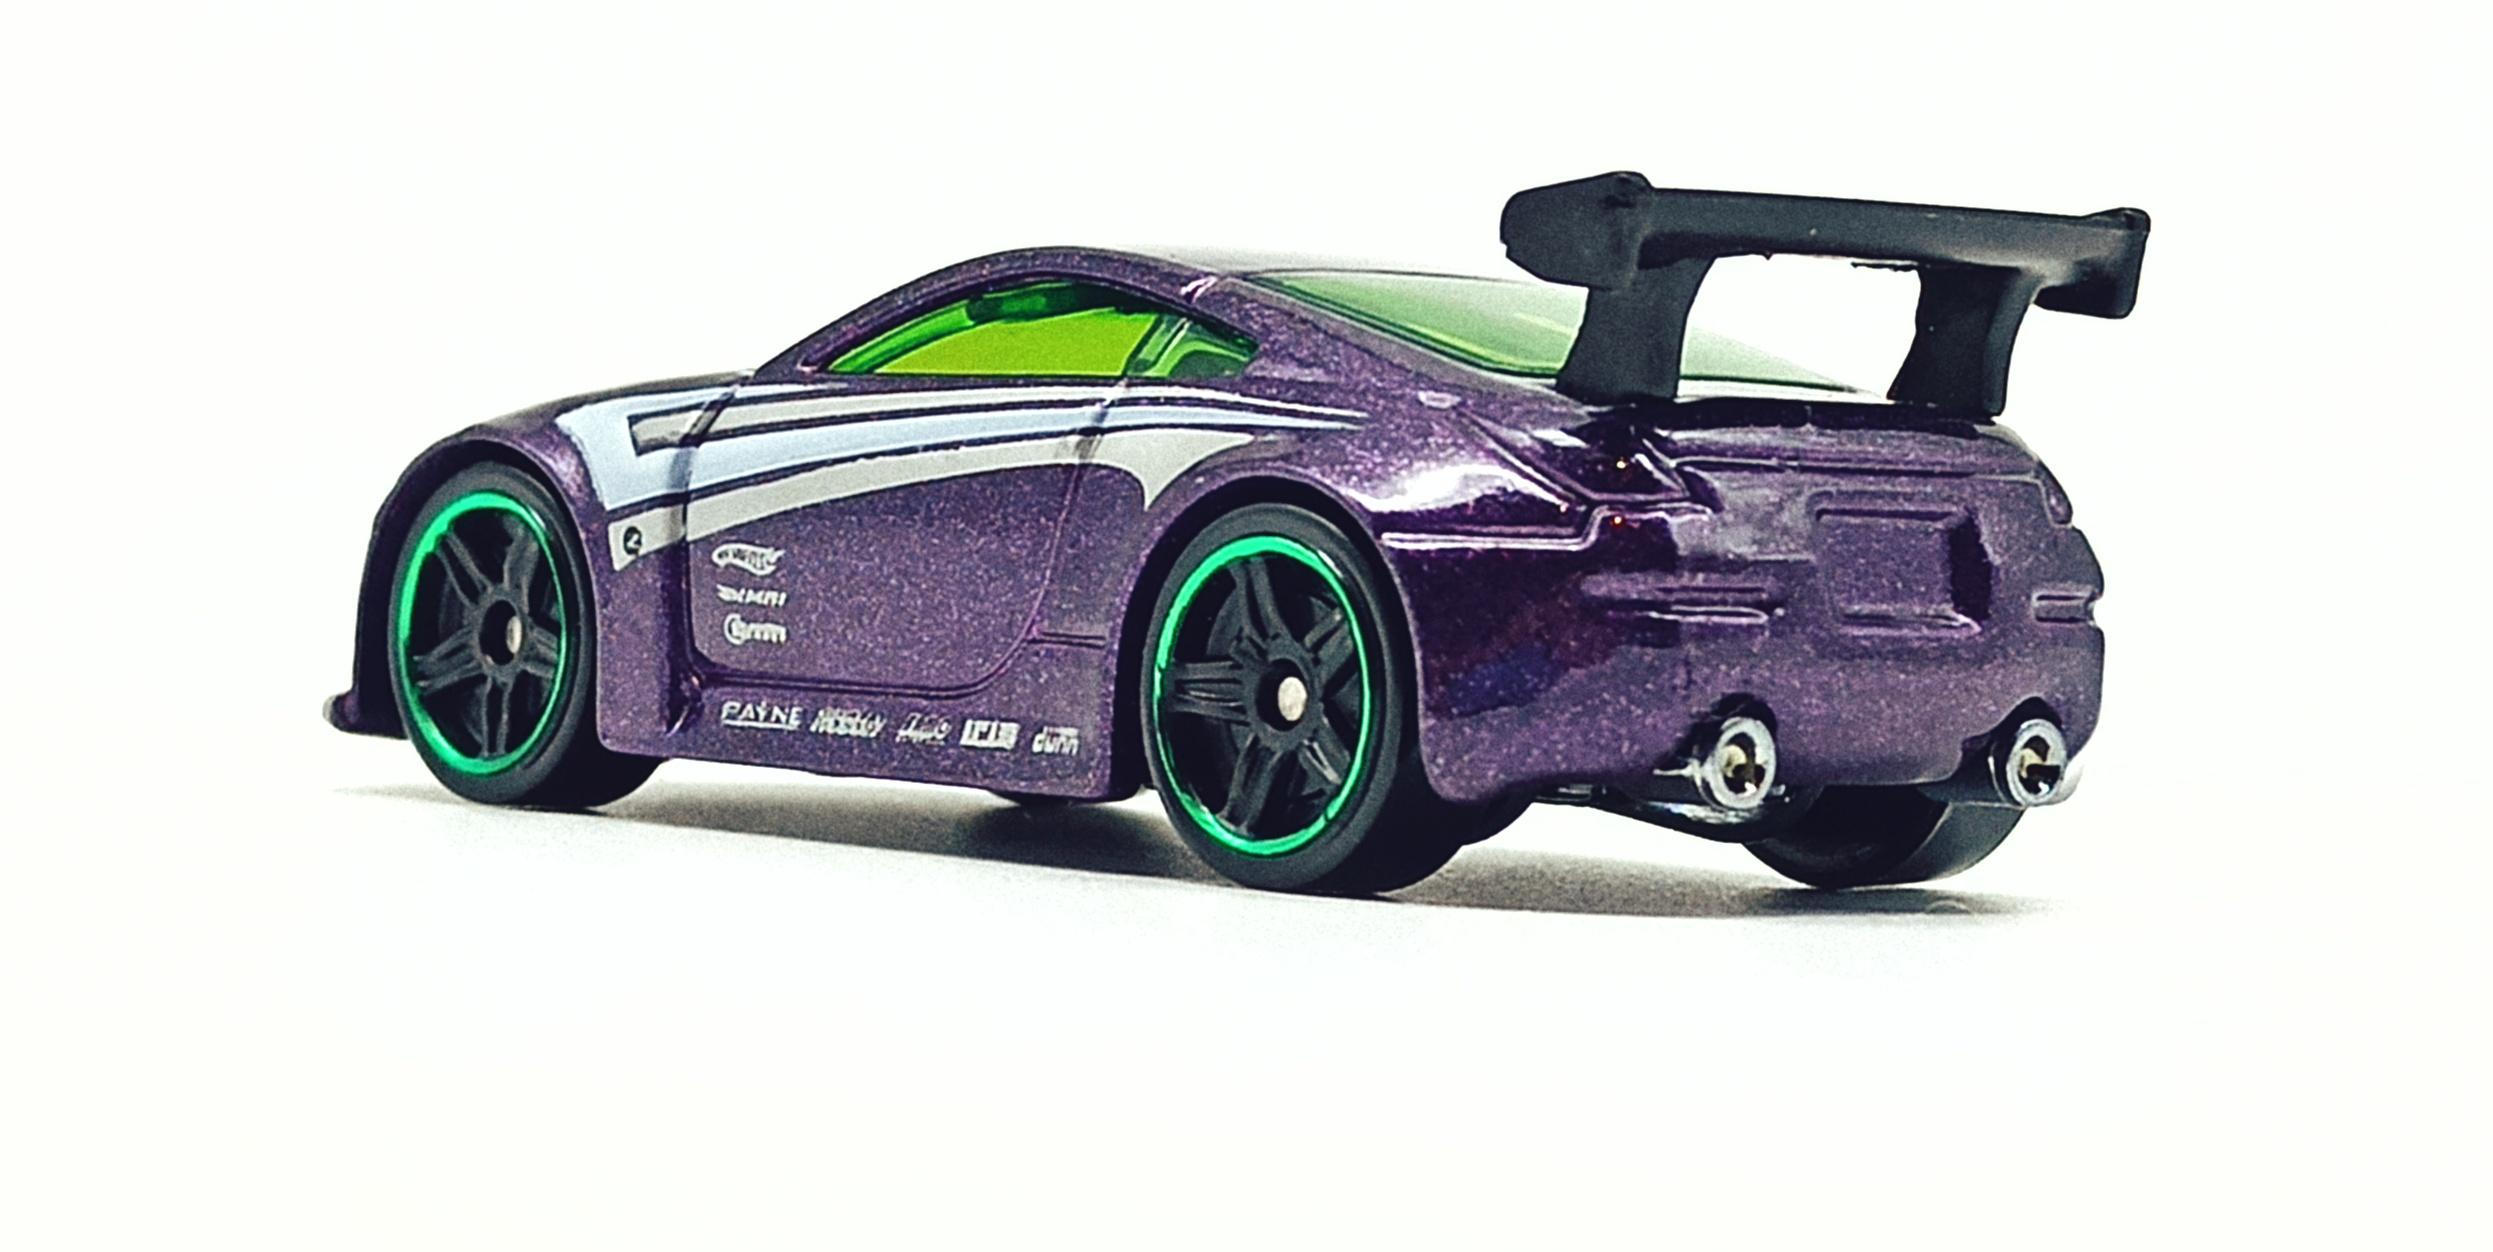 Hot Wheels Nissan 350Z (R7487) 2010 (234/240) Mystery Cars (18/24) purple back angle